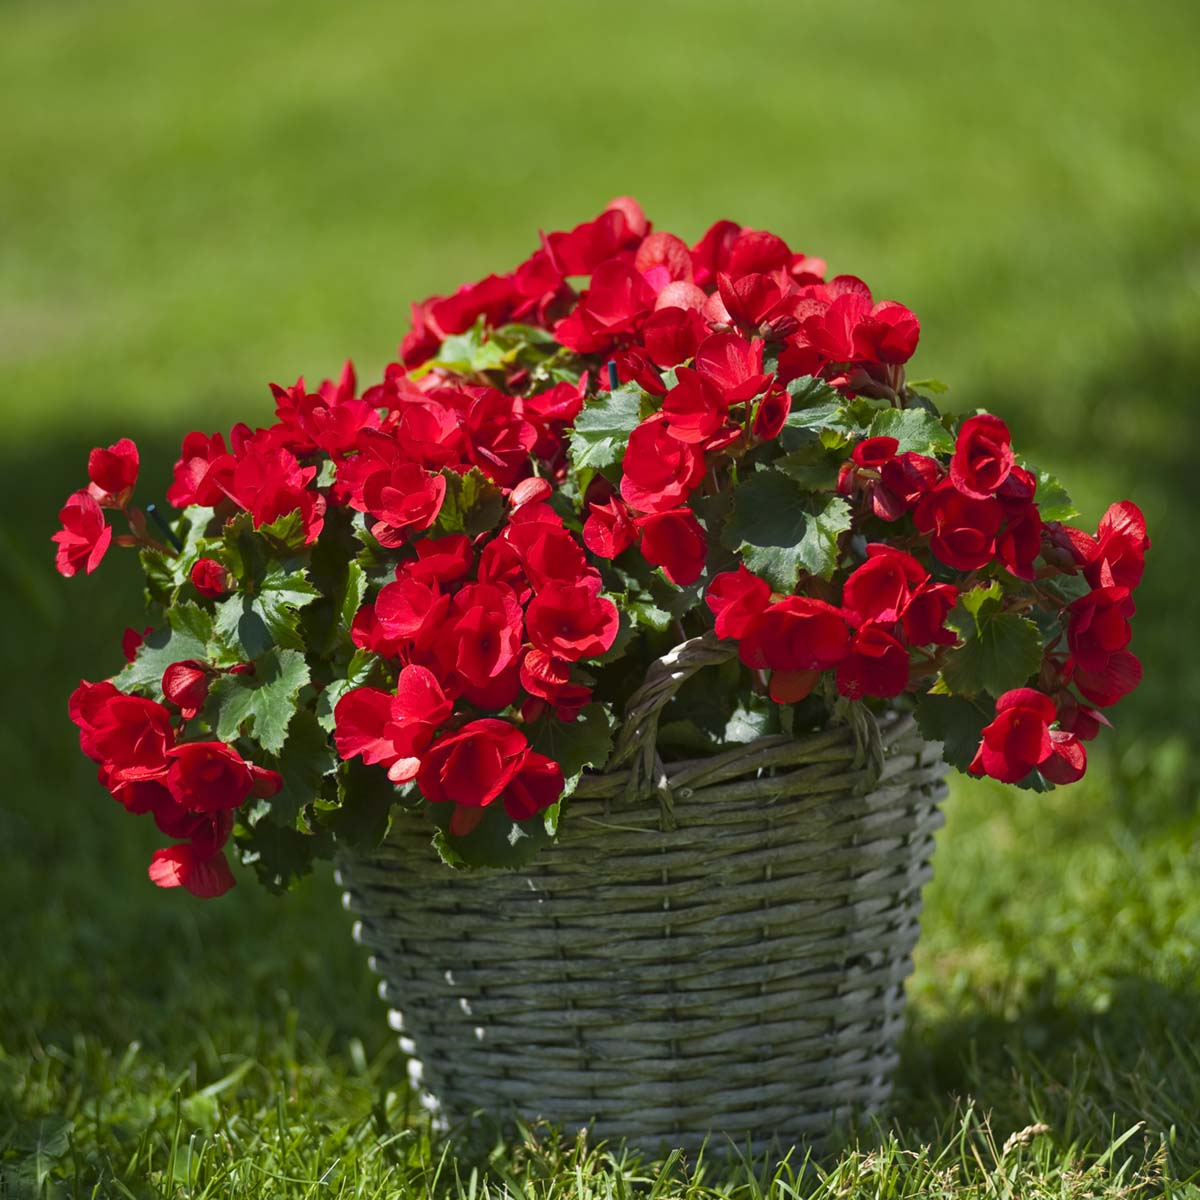 fantoft blomster